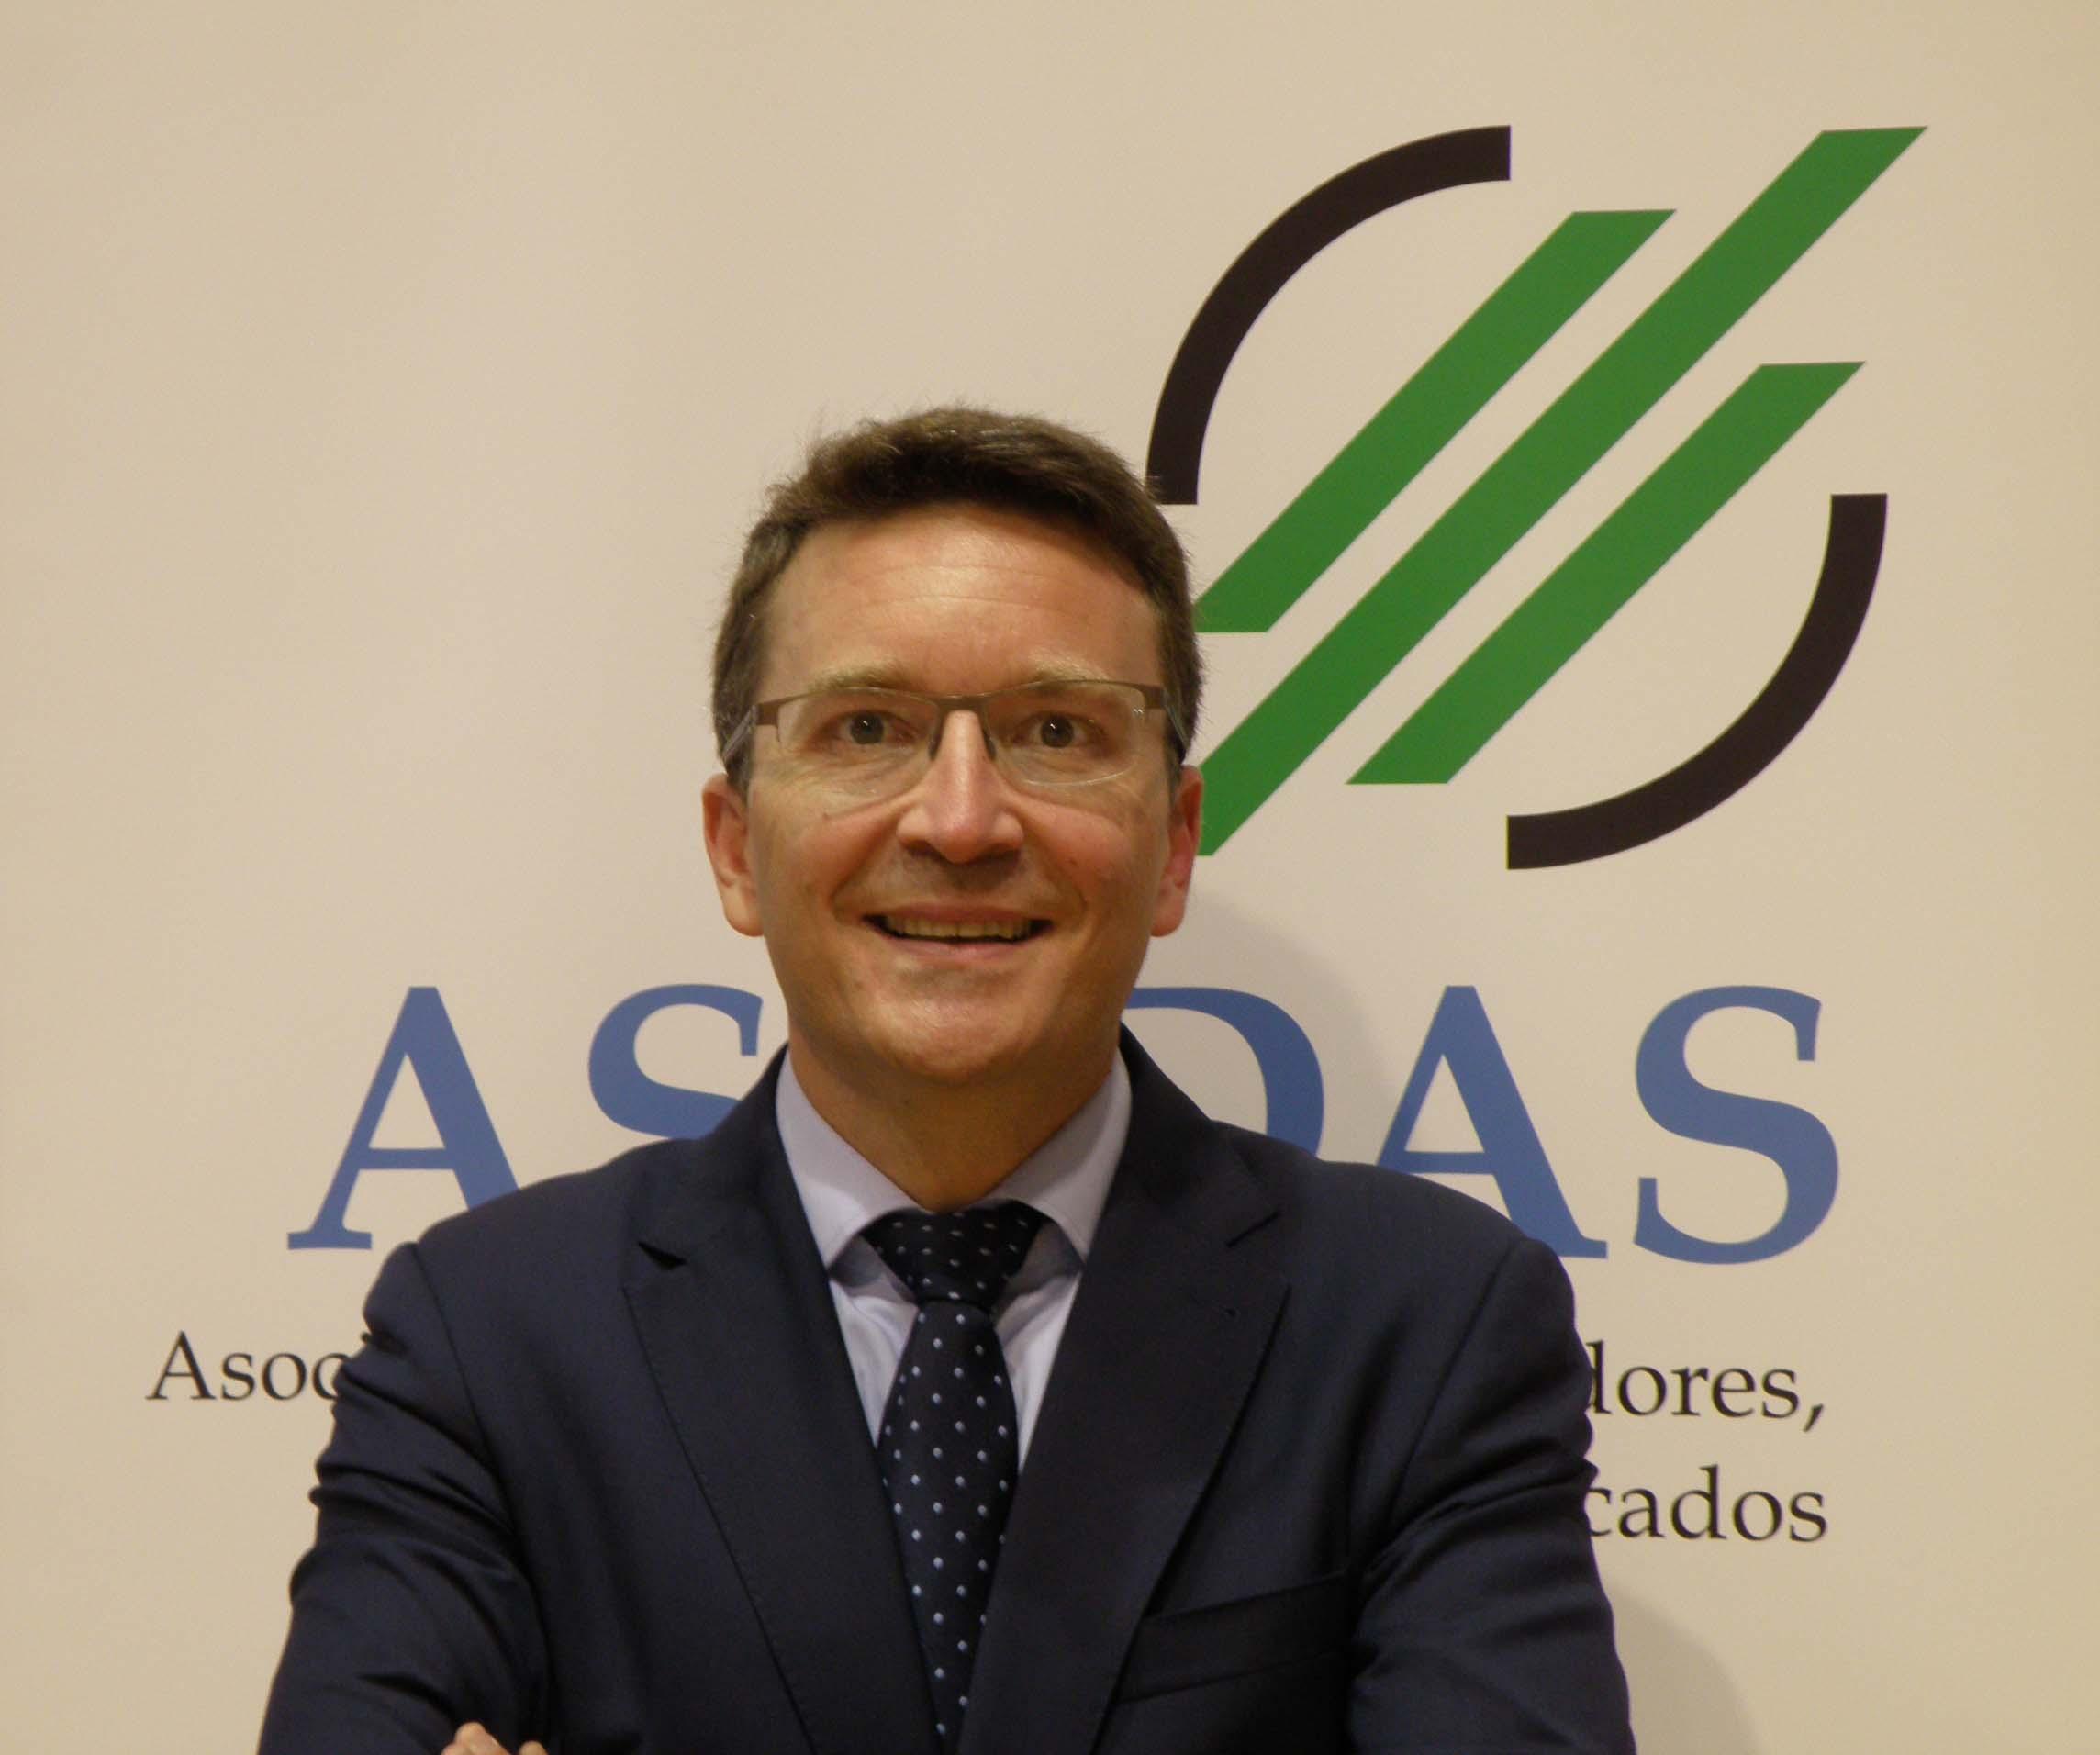 Entrevistas #Agrifood20 🎙️ Felipe Medina, secretario general técnico de ASEDAS